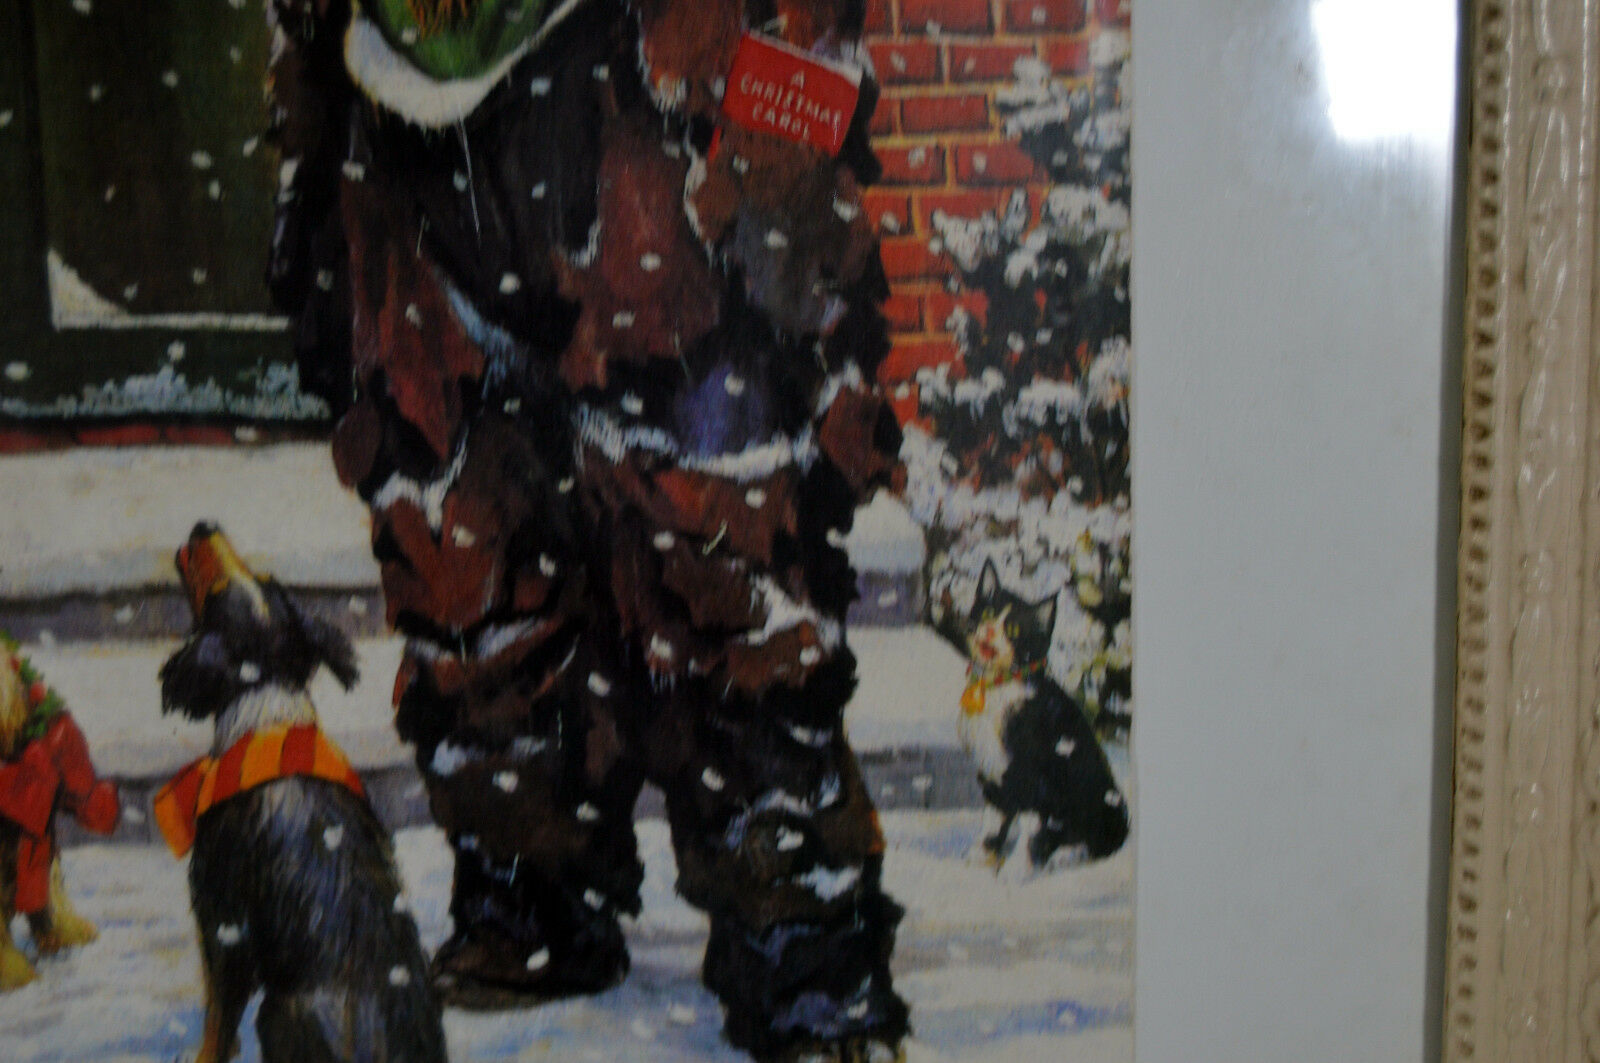 Unique Signed Artist Proof Leighton Jones Emmett Kelly Christmas Carol Scrooge image 5